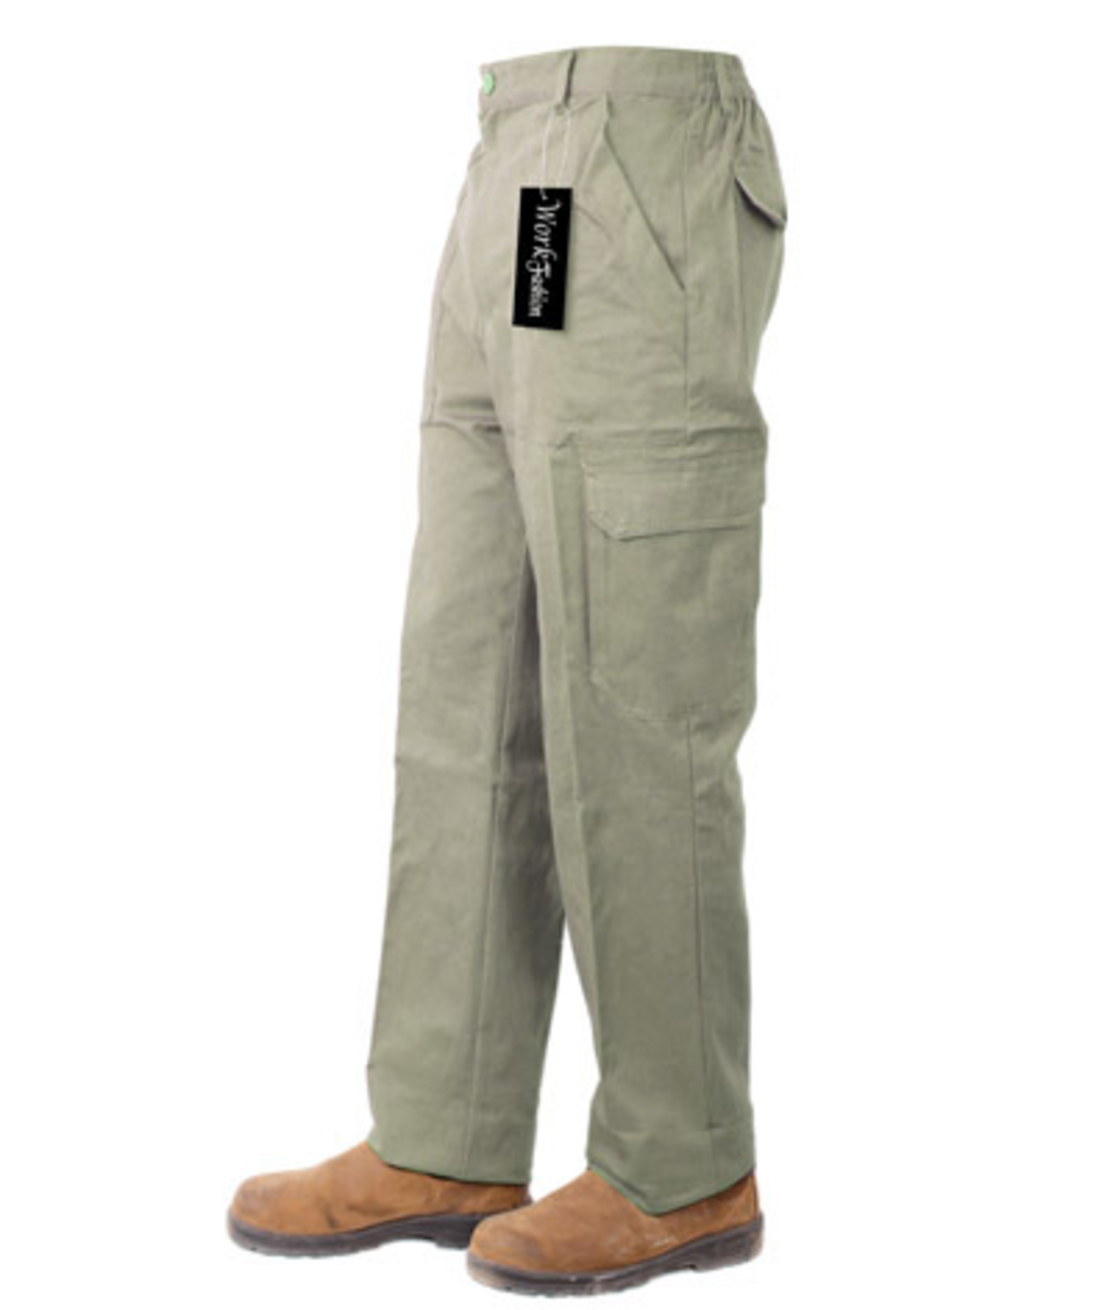 מכנס דגמ